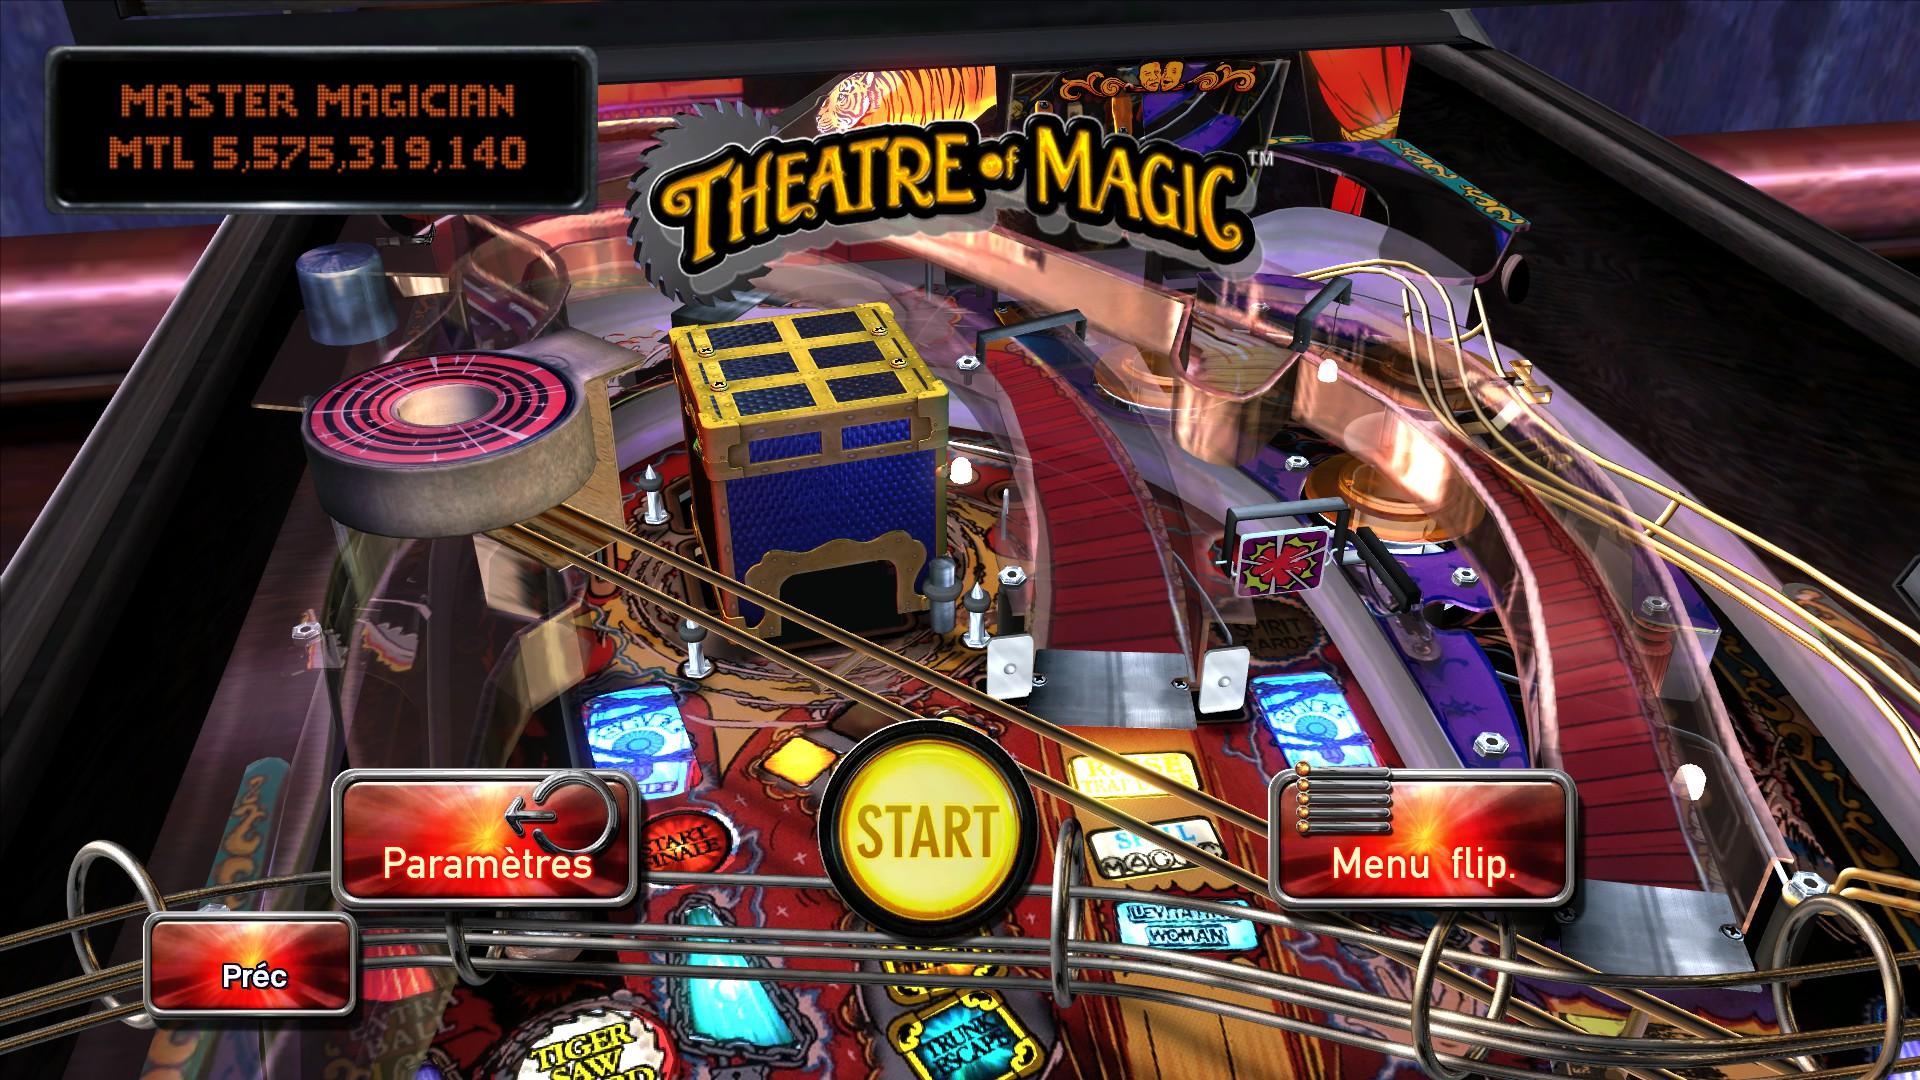 Mantalow: Pinball Arcade: Theatre of Magic (PC) 5,575,319,140 points on 2015-07-01 13:48:36